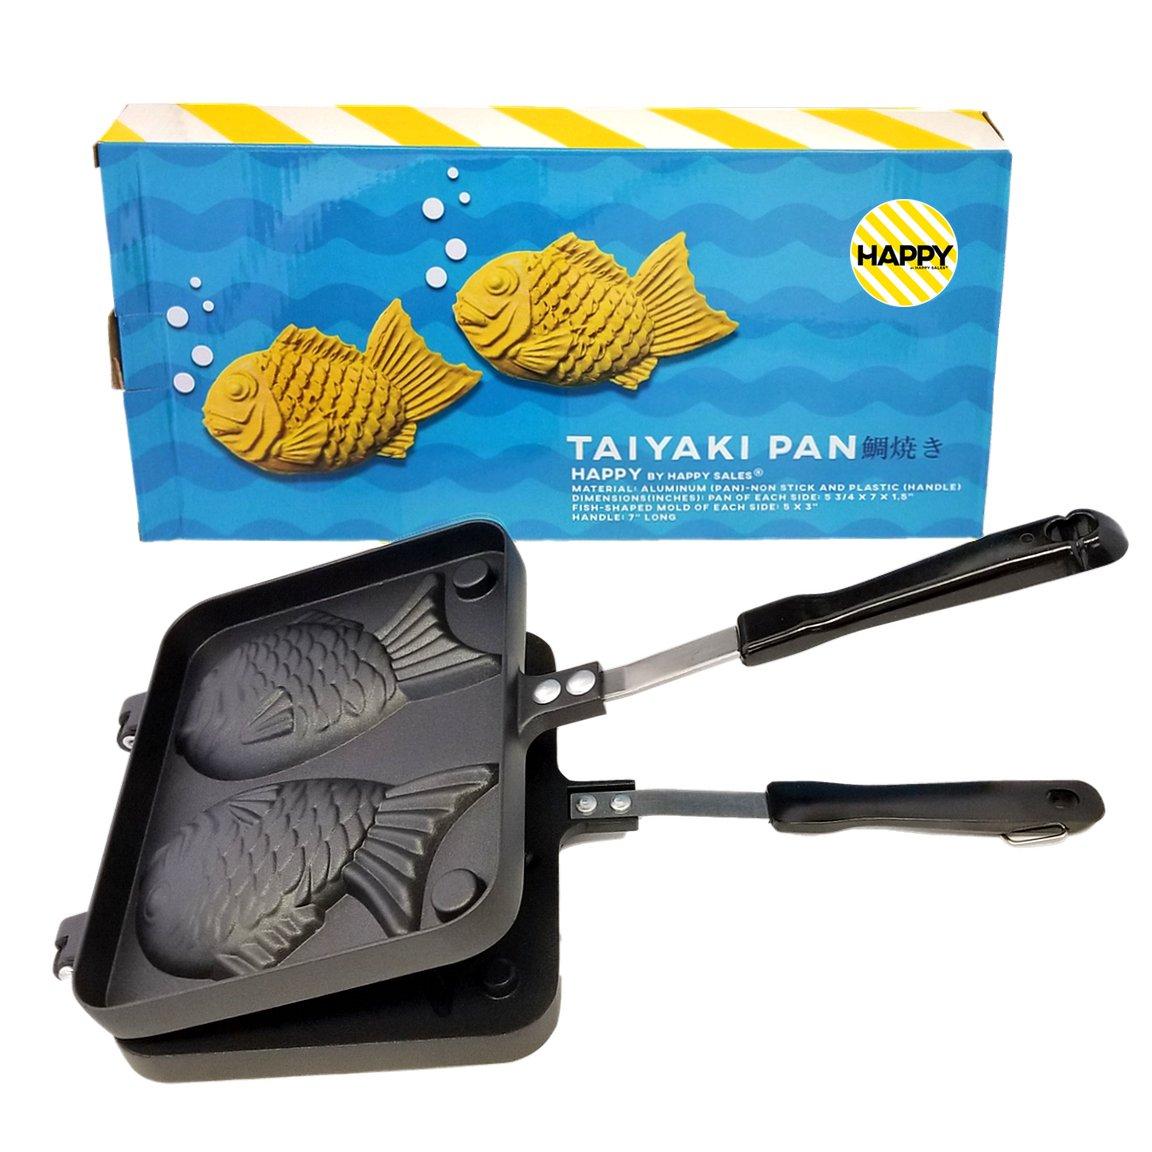 Happy Sales HSTYK1, Taiyaki Pan Fish shape, 8W x 2H x 12L, Black